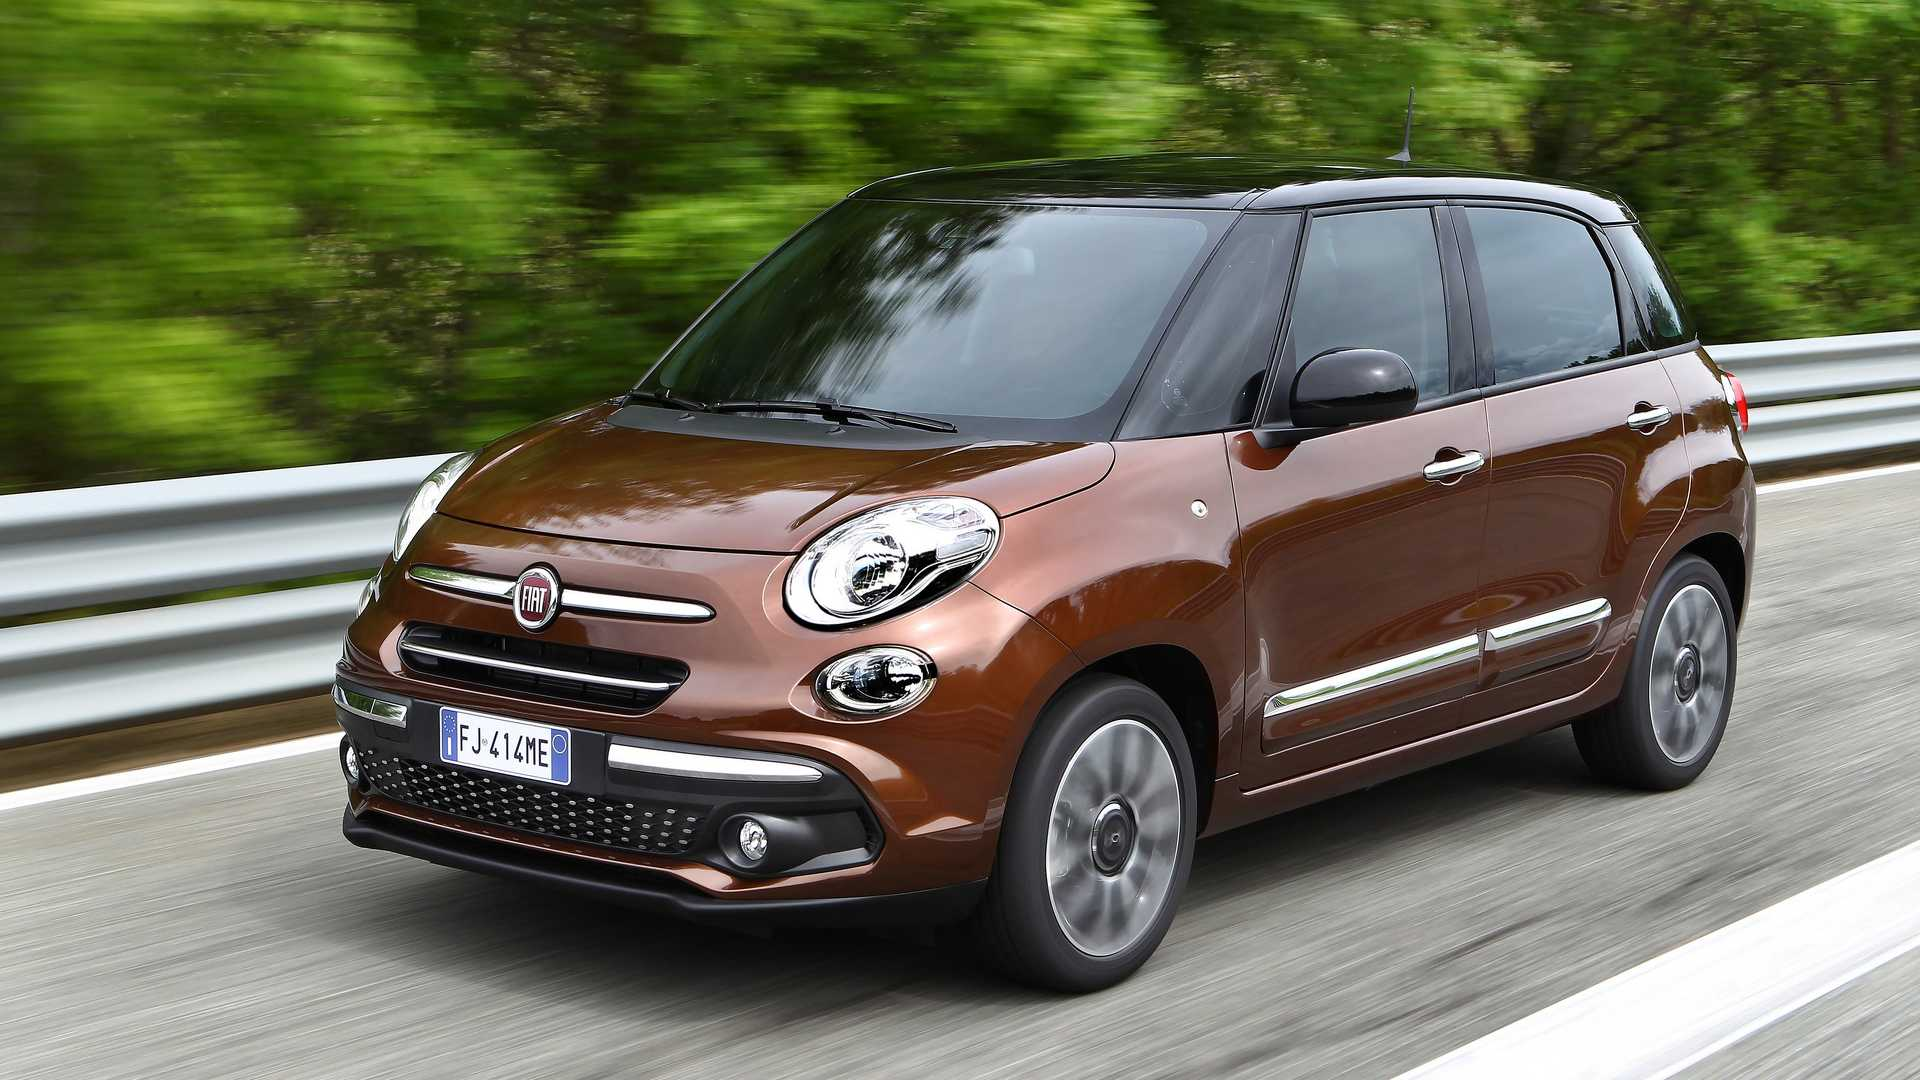 2018_Fiat_500L_facelift_02